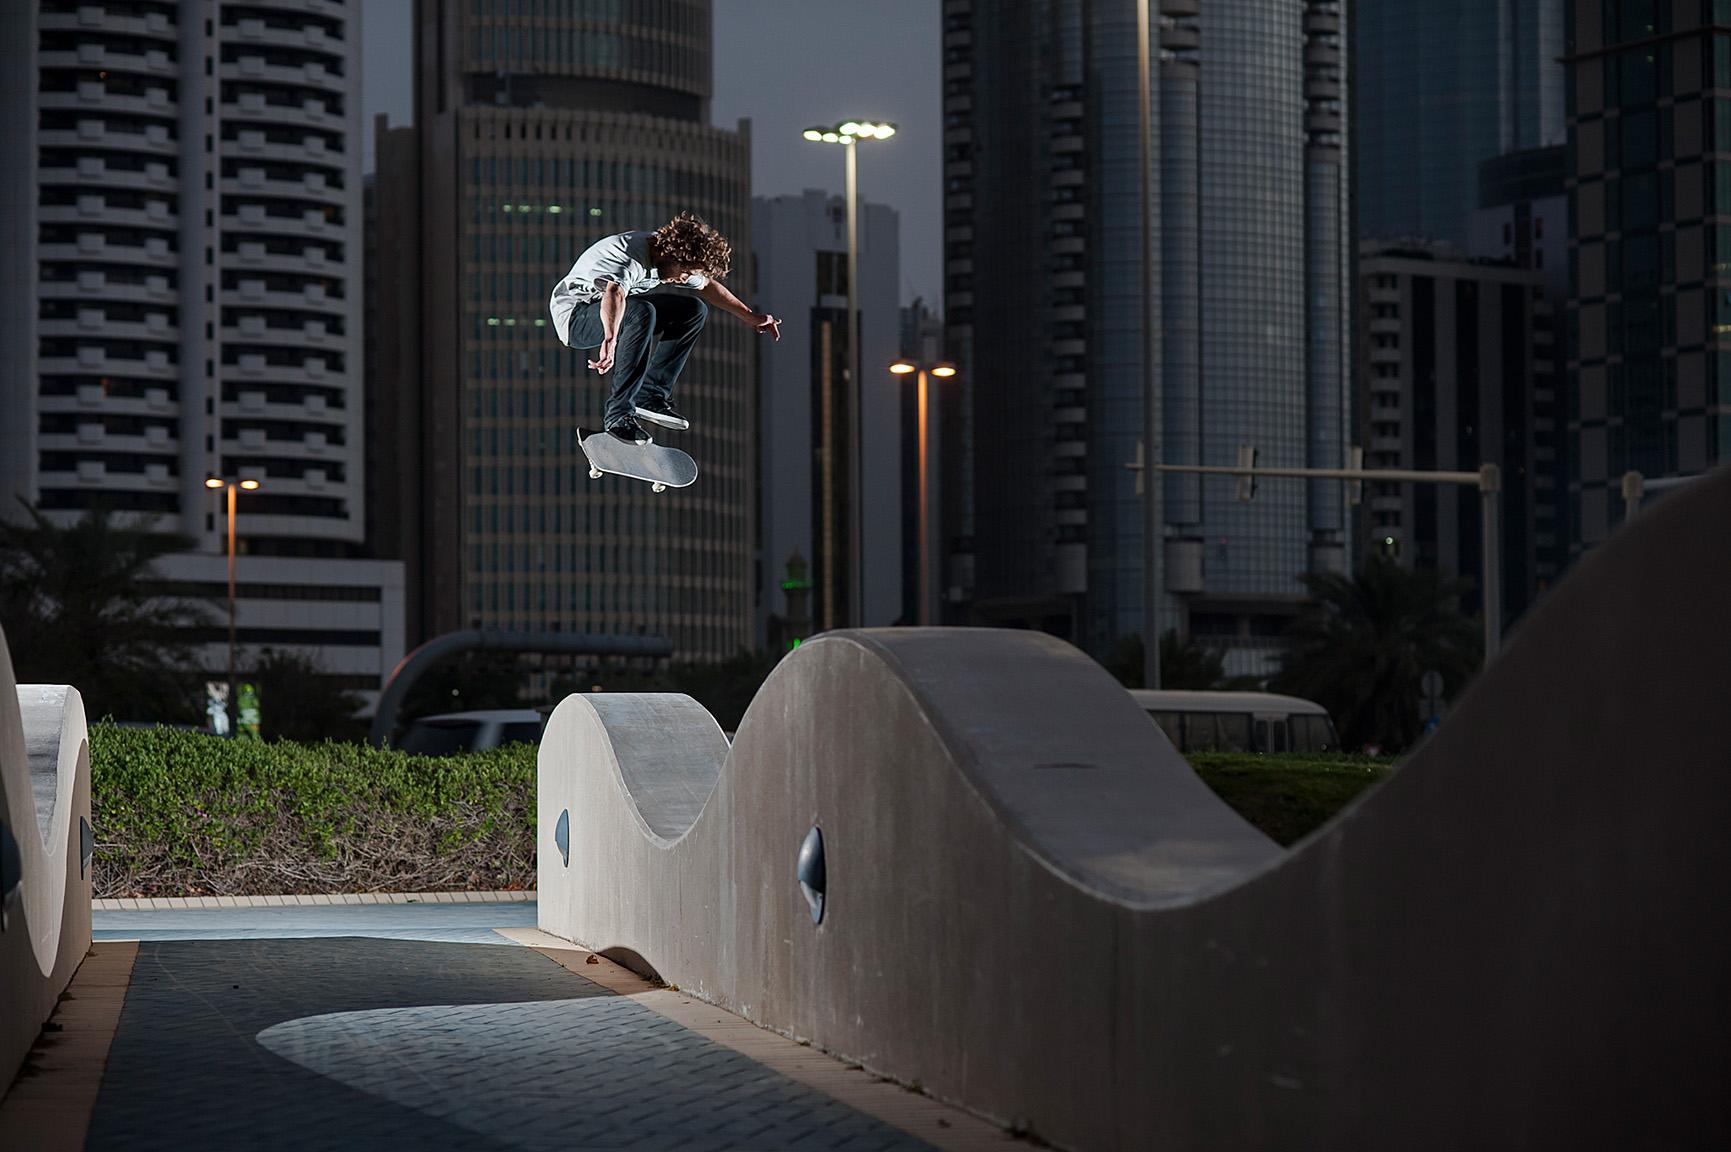 Patrick Rogalski, Abu Dhabi, U.A.E.